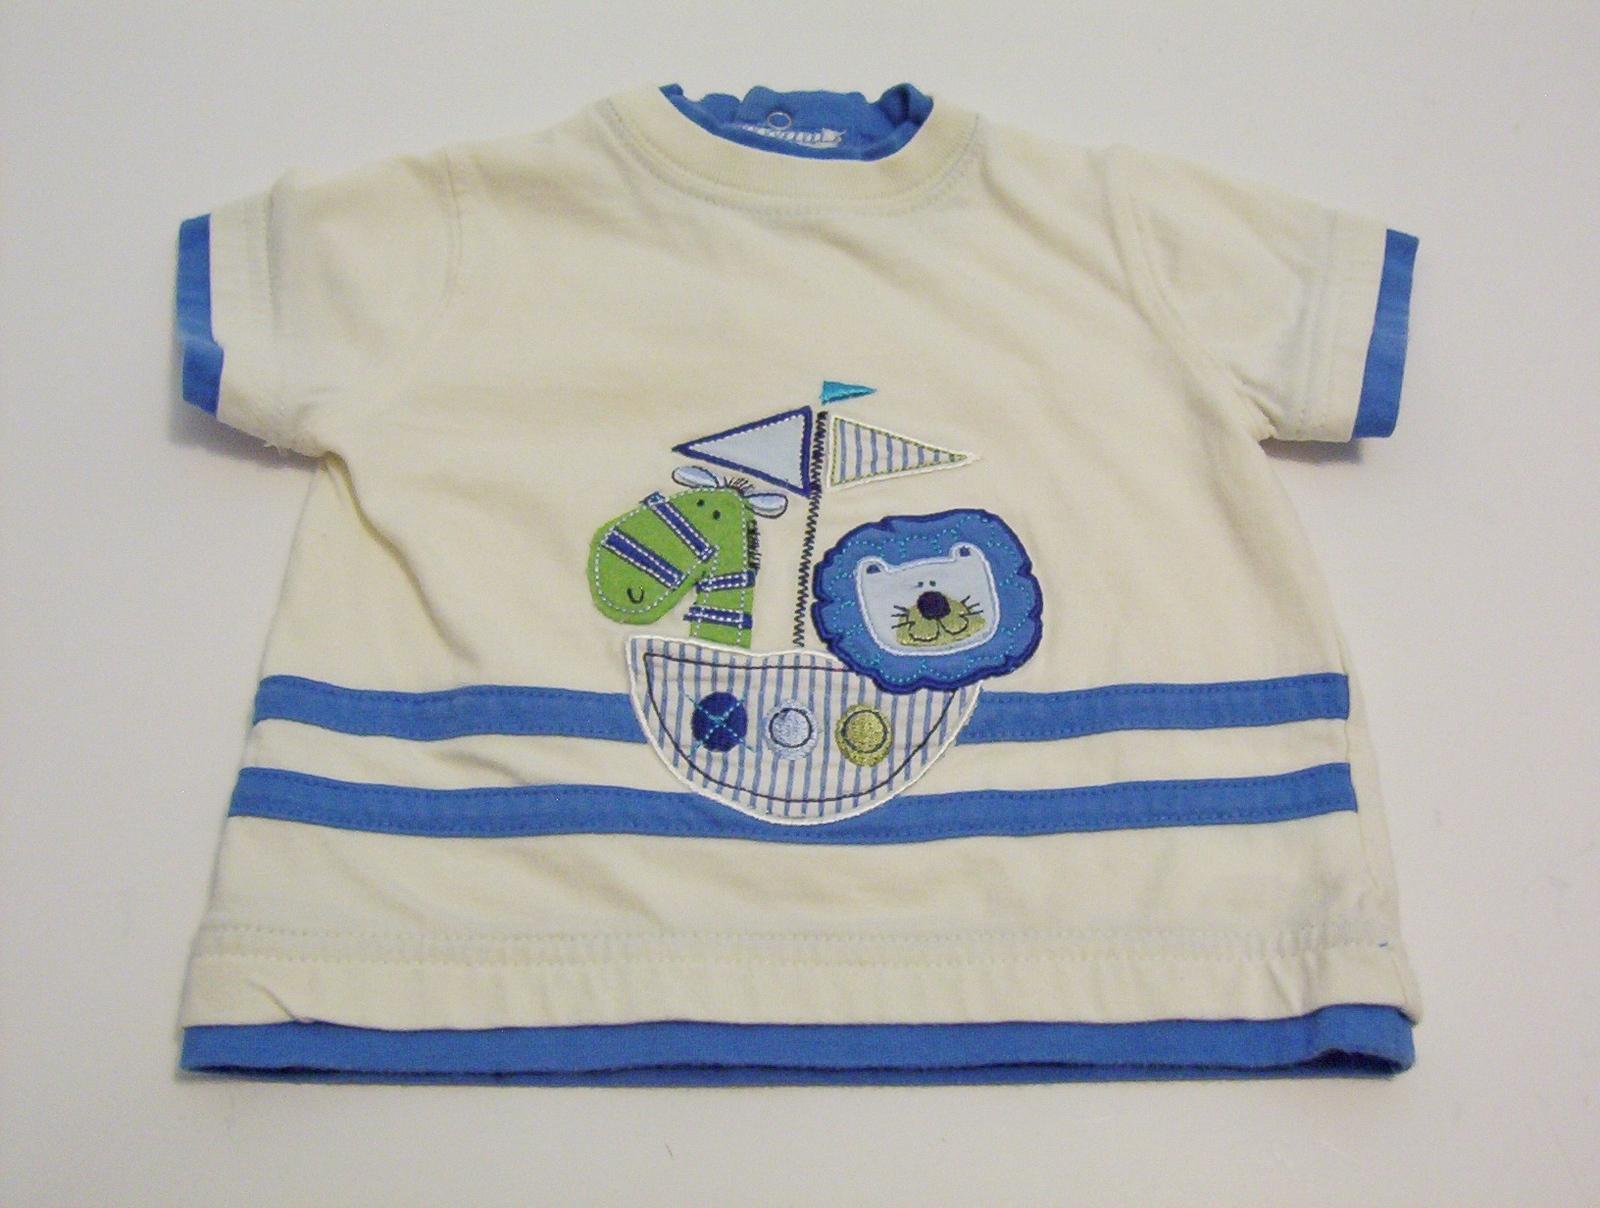 f05dbb401 Okie-Dokie Baby Boy 3-6 Months T-Shirt Cream and 13 similar items